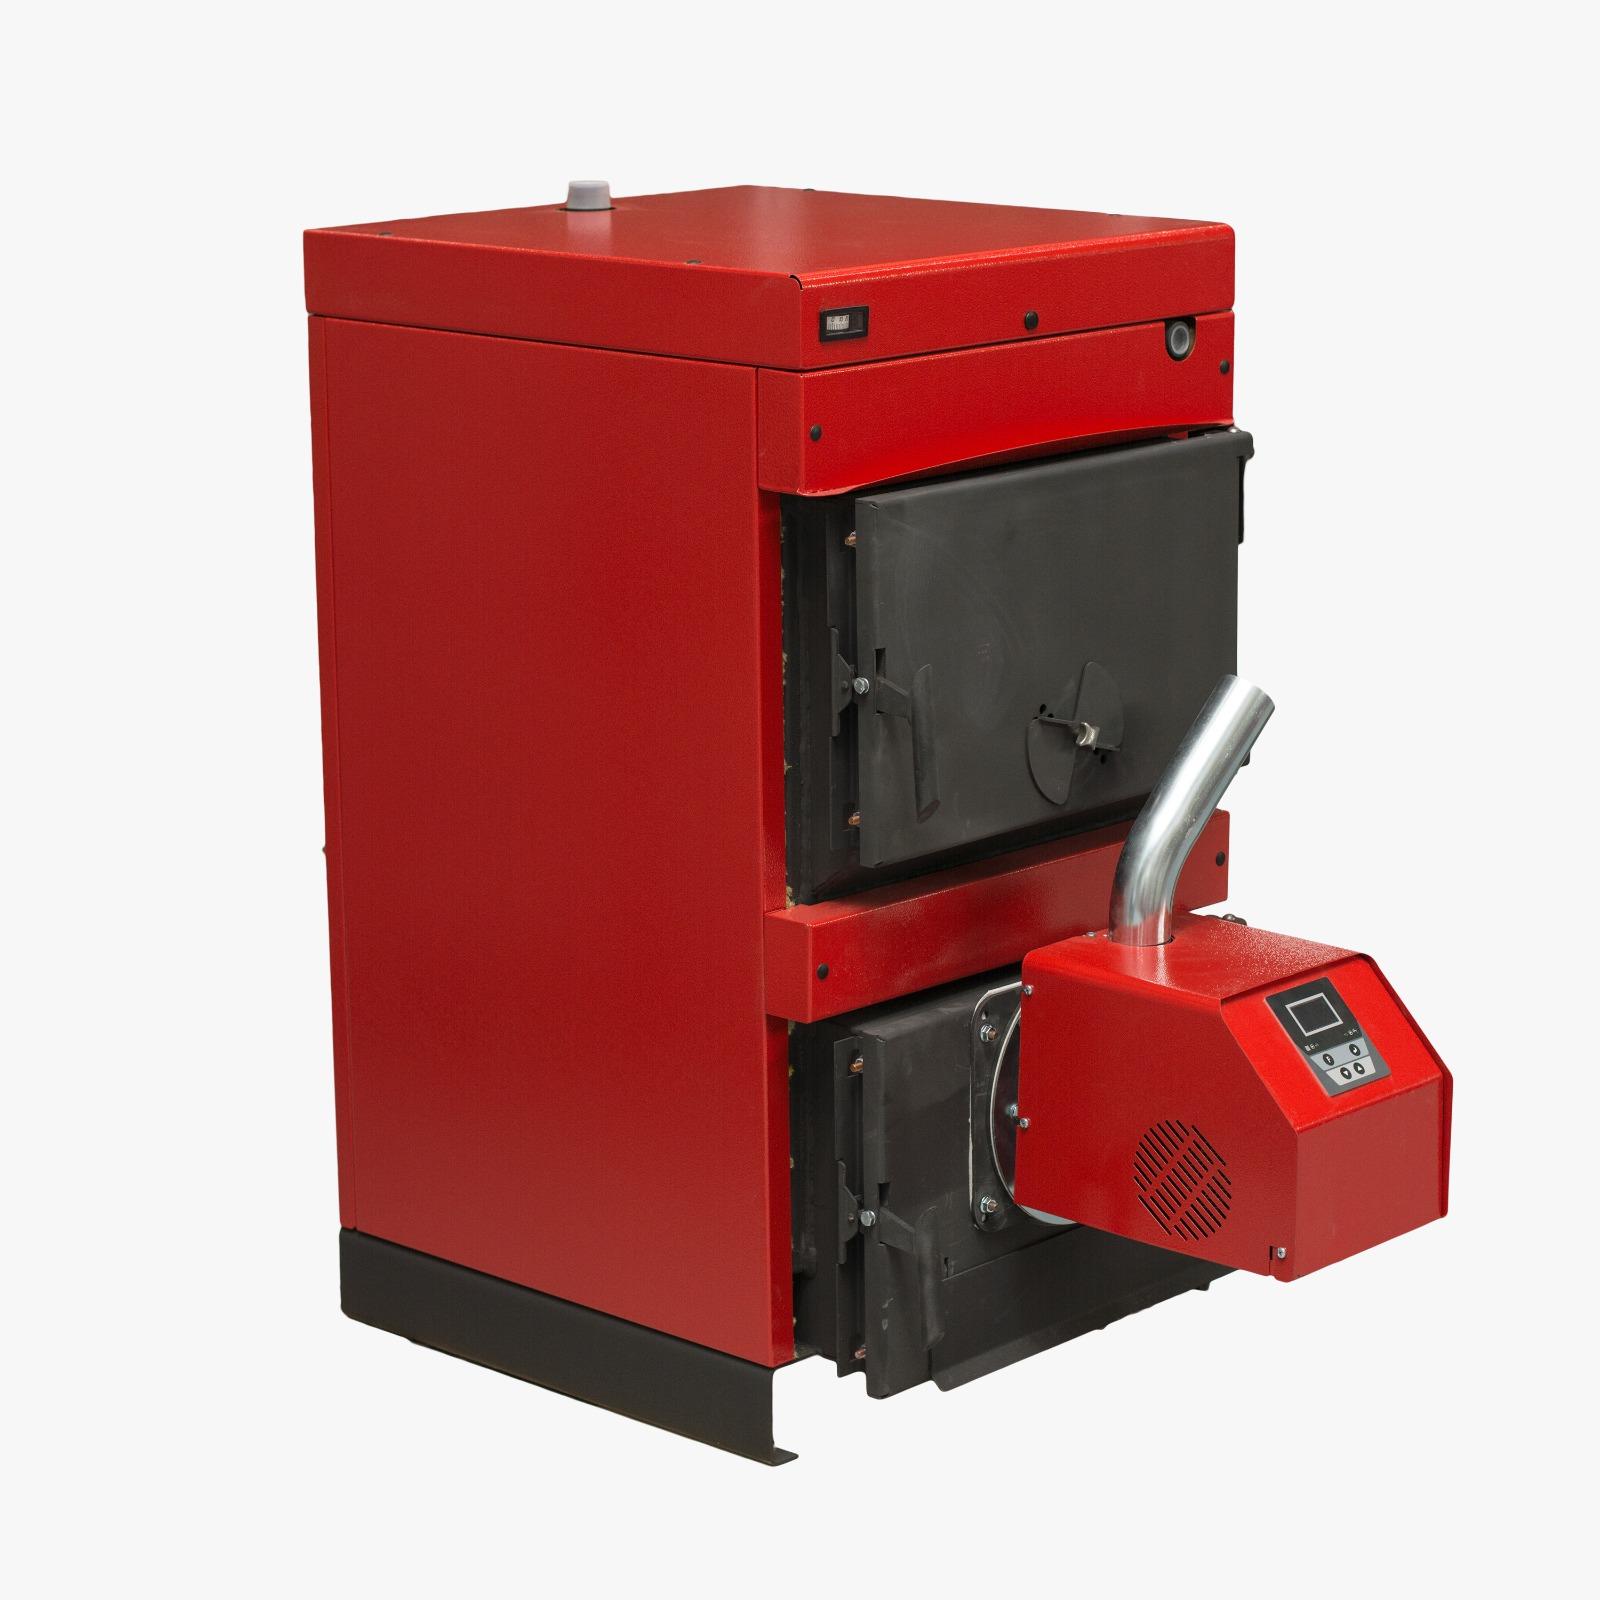 Pachet centrala mixta lemn si peleti Sunsystem Burnit WBS 70 KW cu arzator Peleti Pell Eco 70 kw, snec, aprindere automata imagine fornello.ro